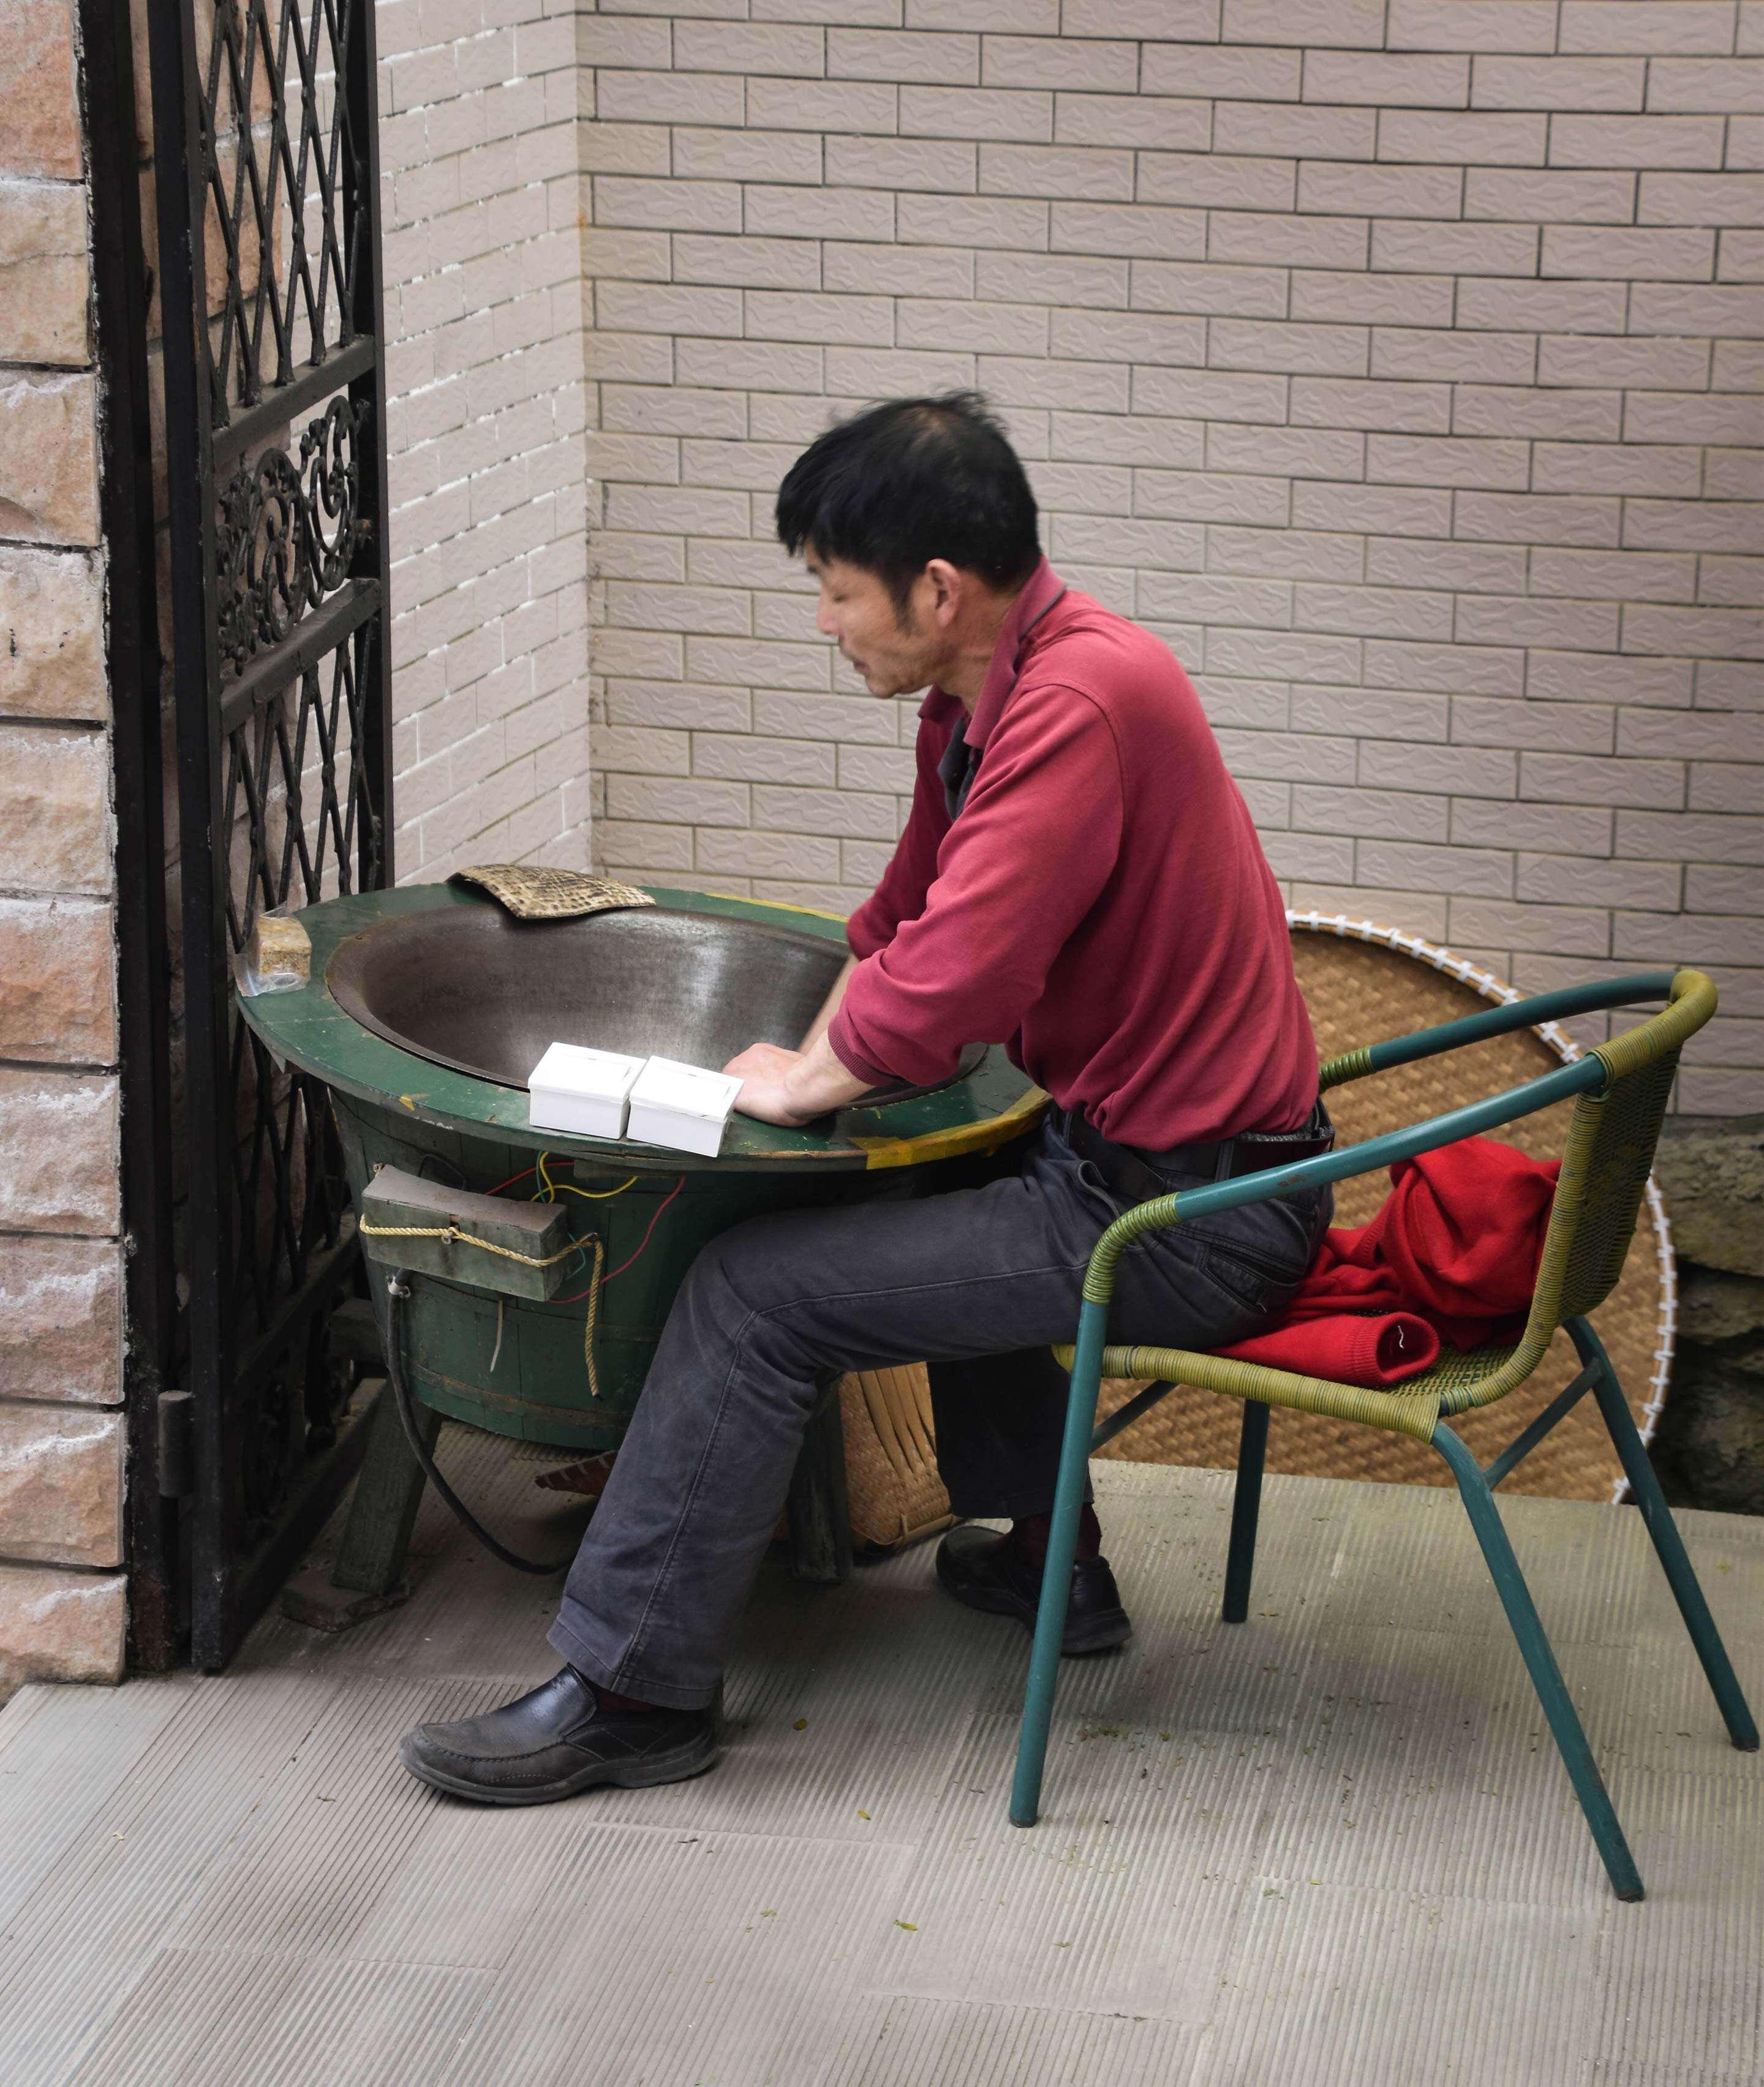 dragonwell-day-2-shui-huamin-wok-0749-largex2